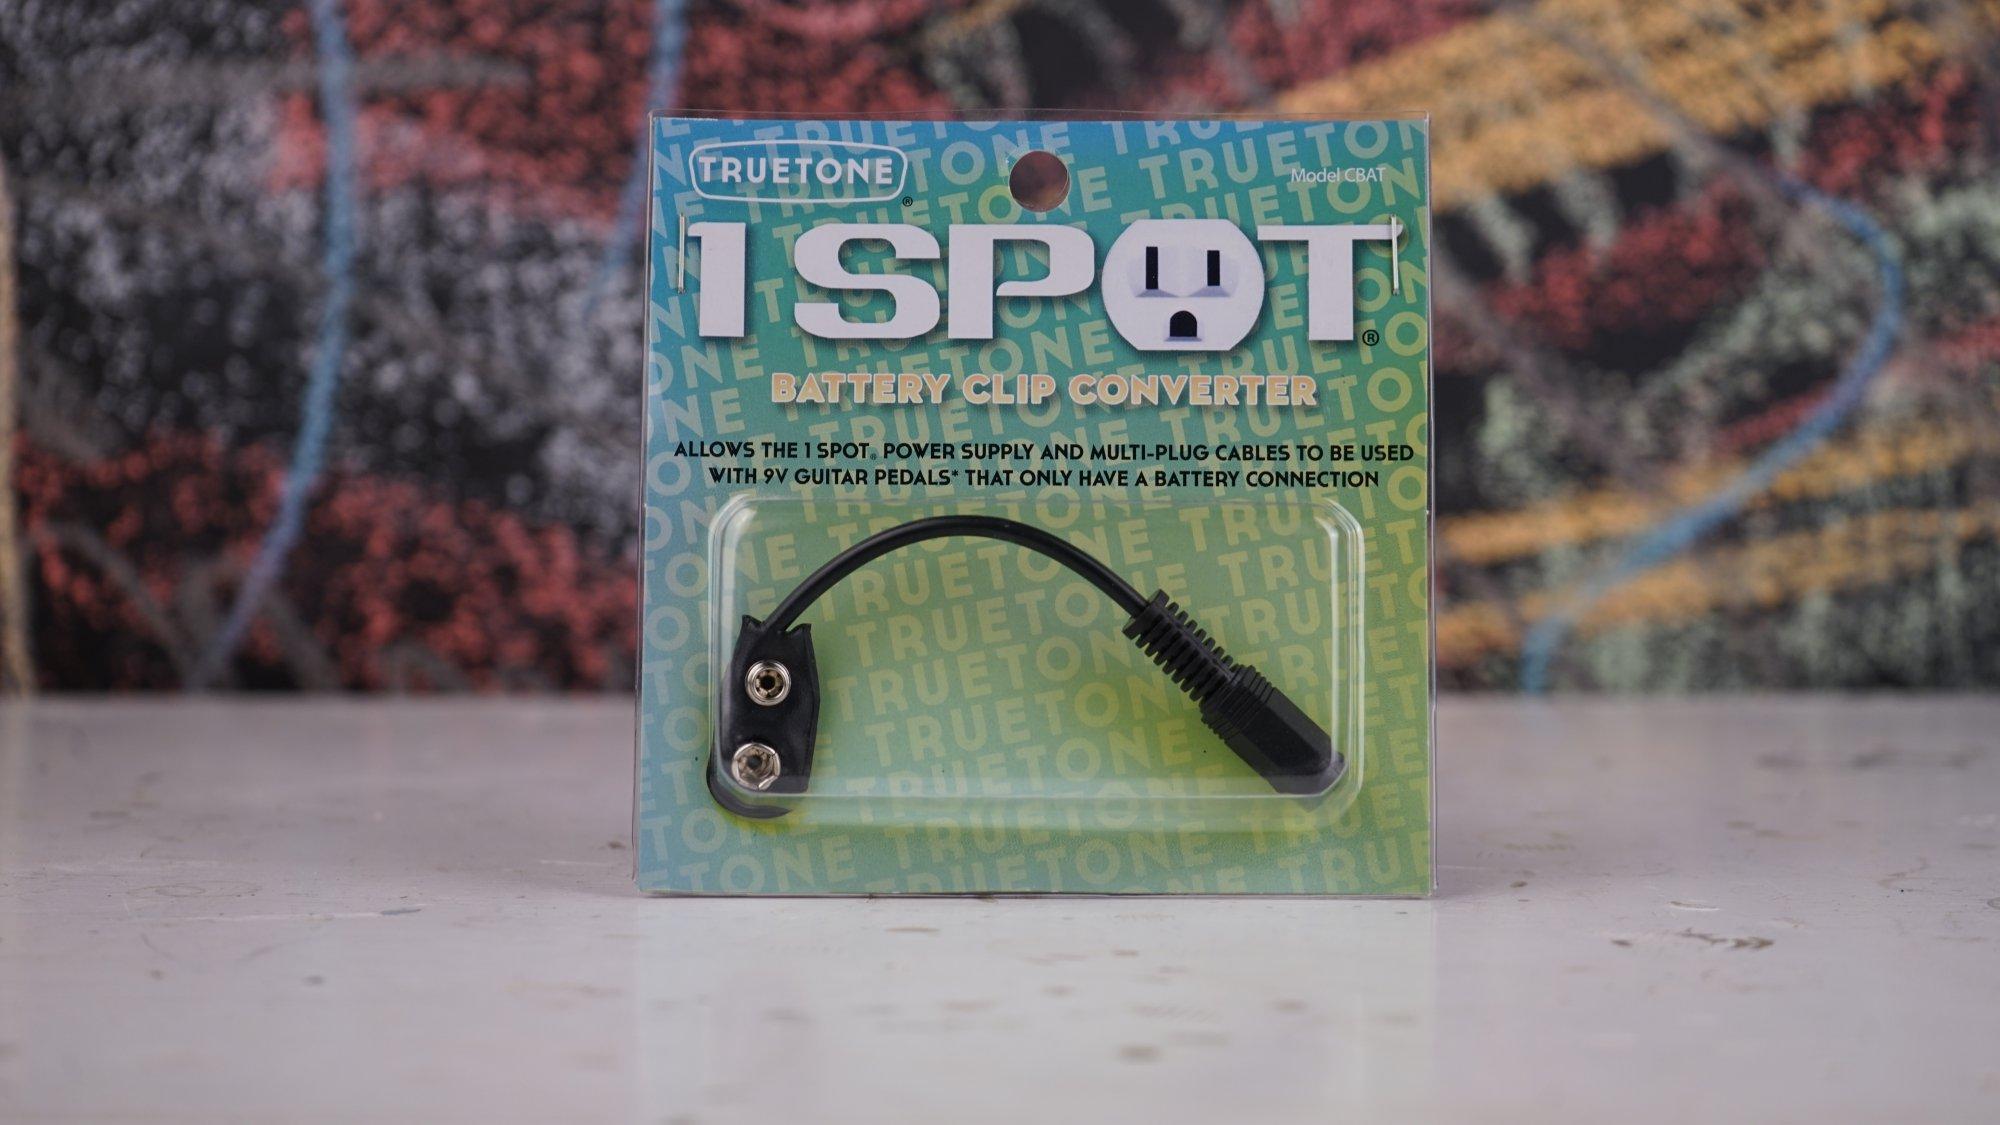 1 Spot 9V Battery Clip Converter CBAT